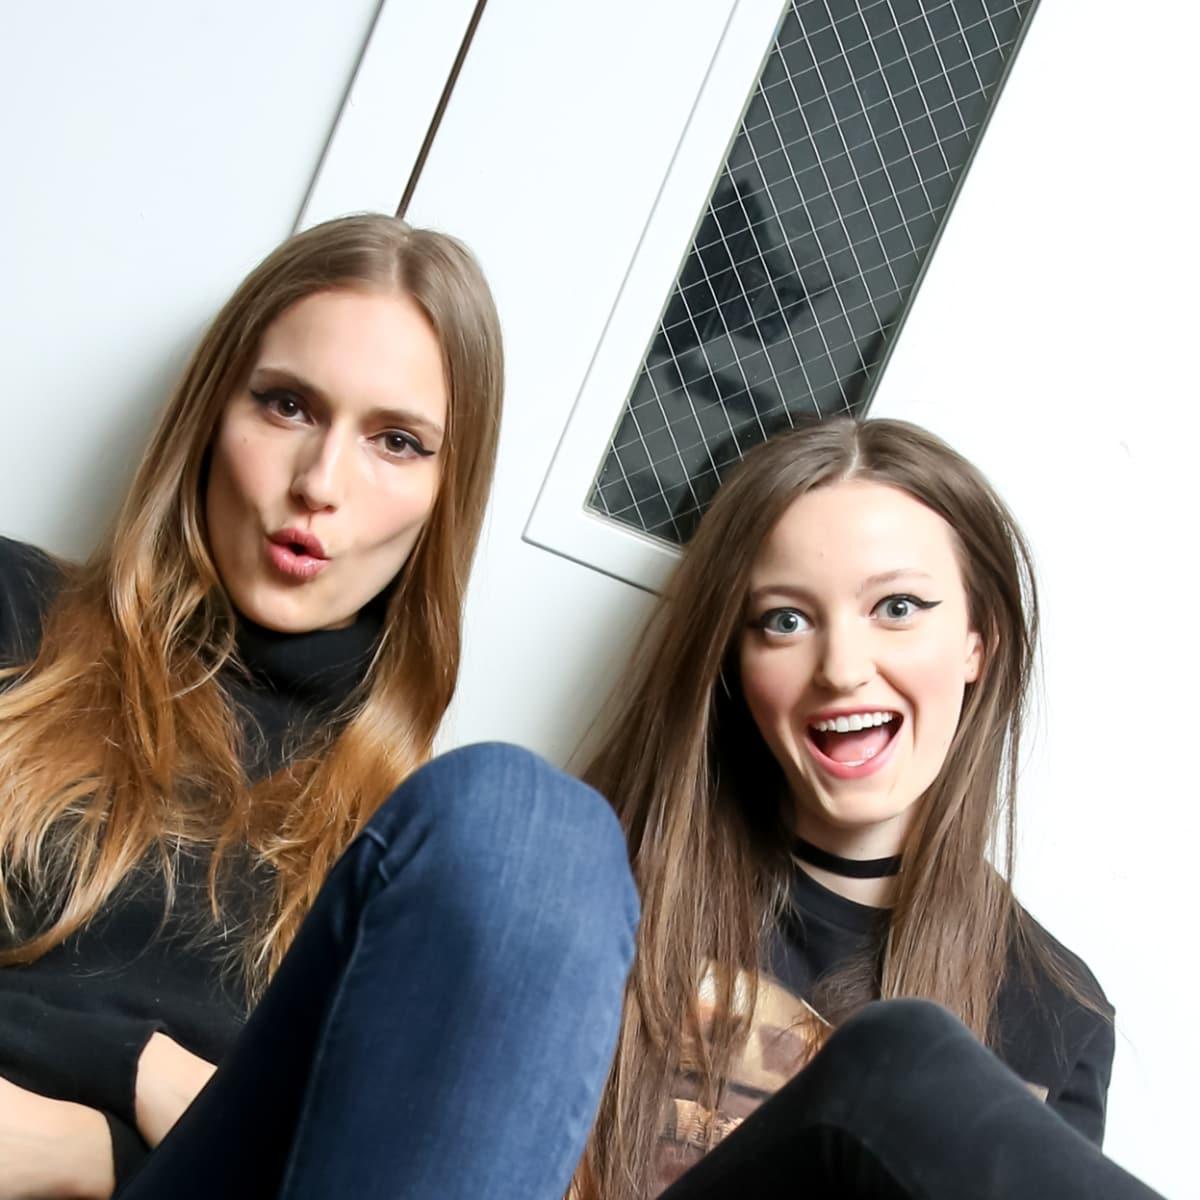 Nicole Miller fall 2016 runway show models backstge